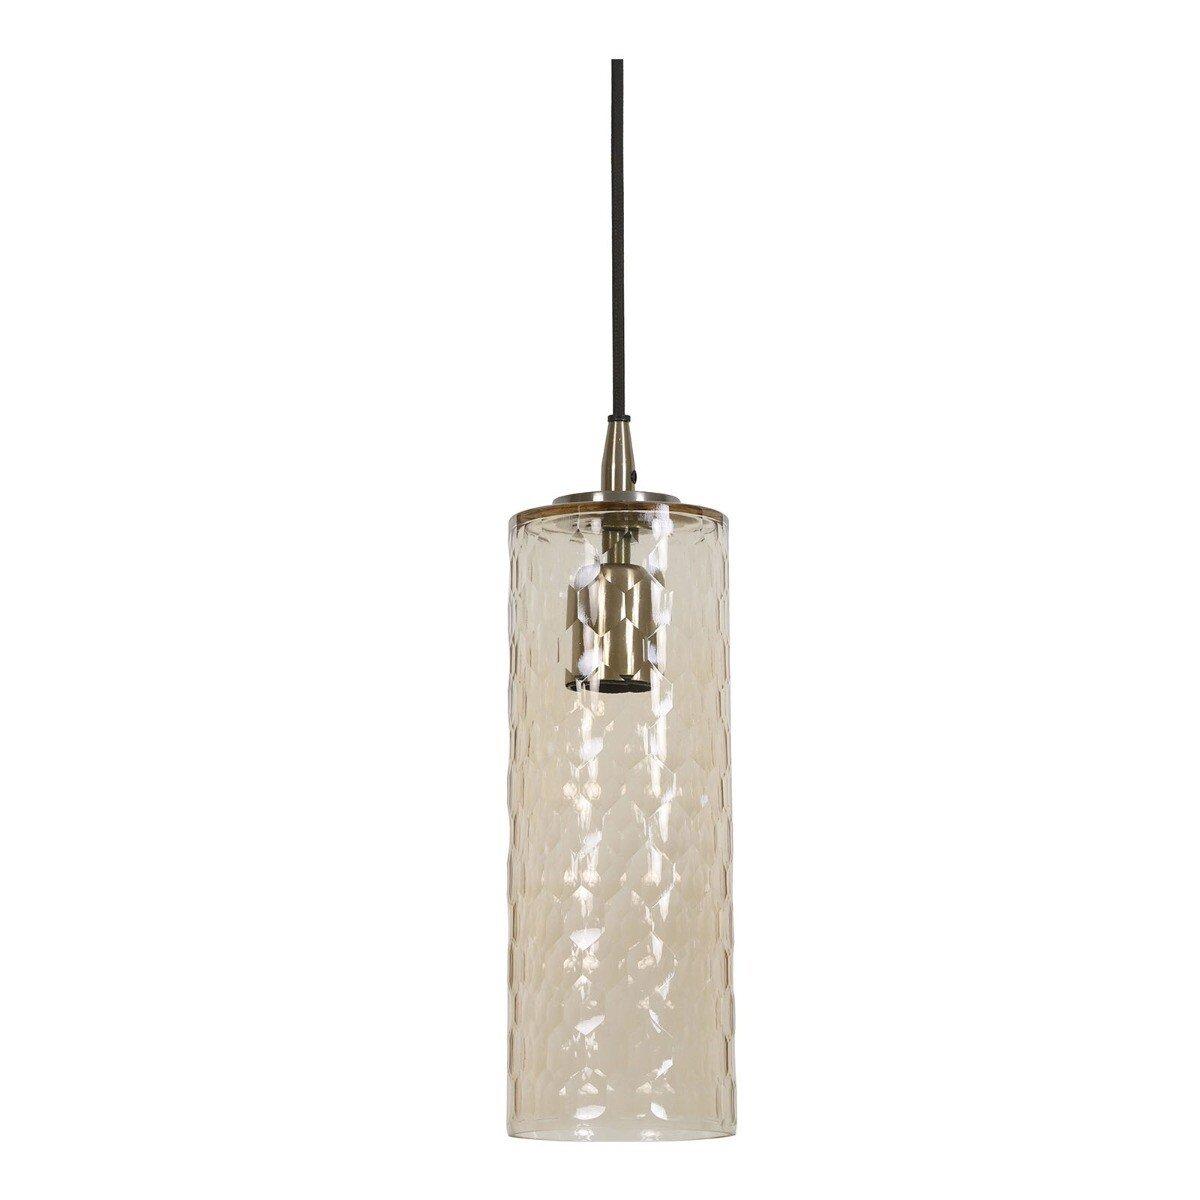 Light & Living Hanglamp DYLANA glas antiek brons S